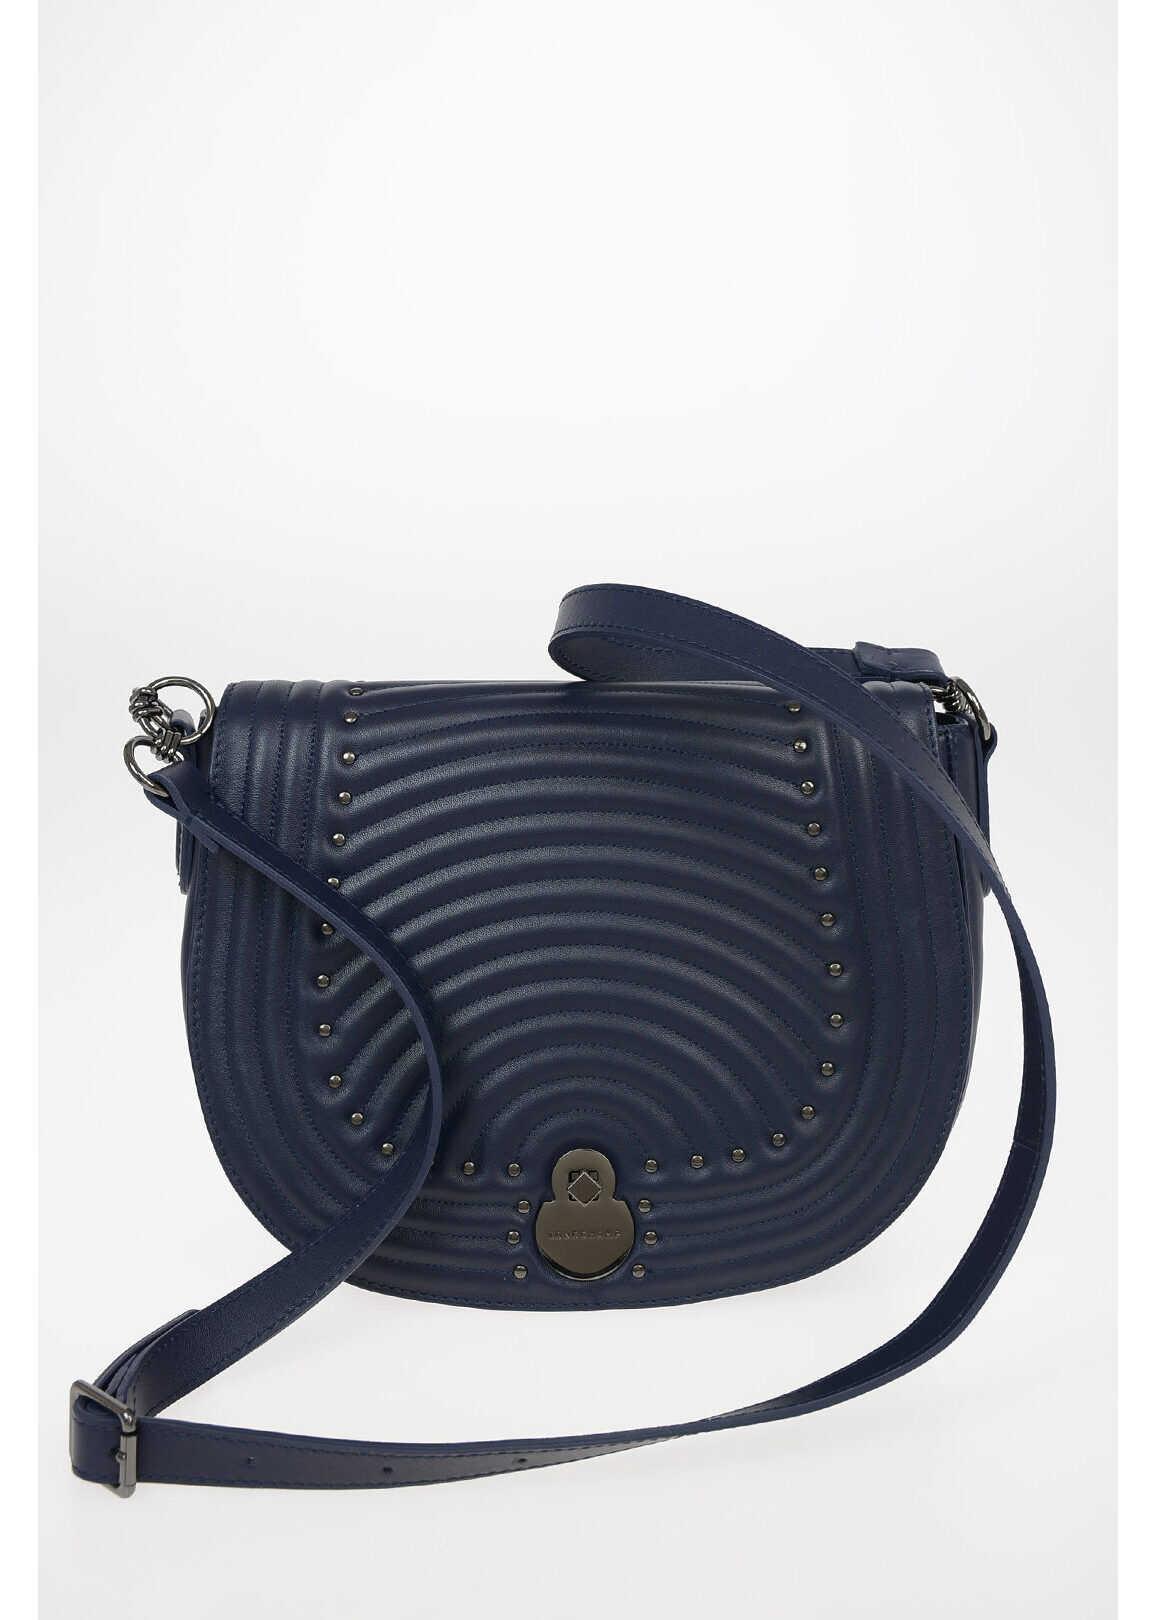 Longchamp Studded Leather Saddle Bag with Adjustable Shoulder Strap BLUE imagine b-mall.ro